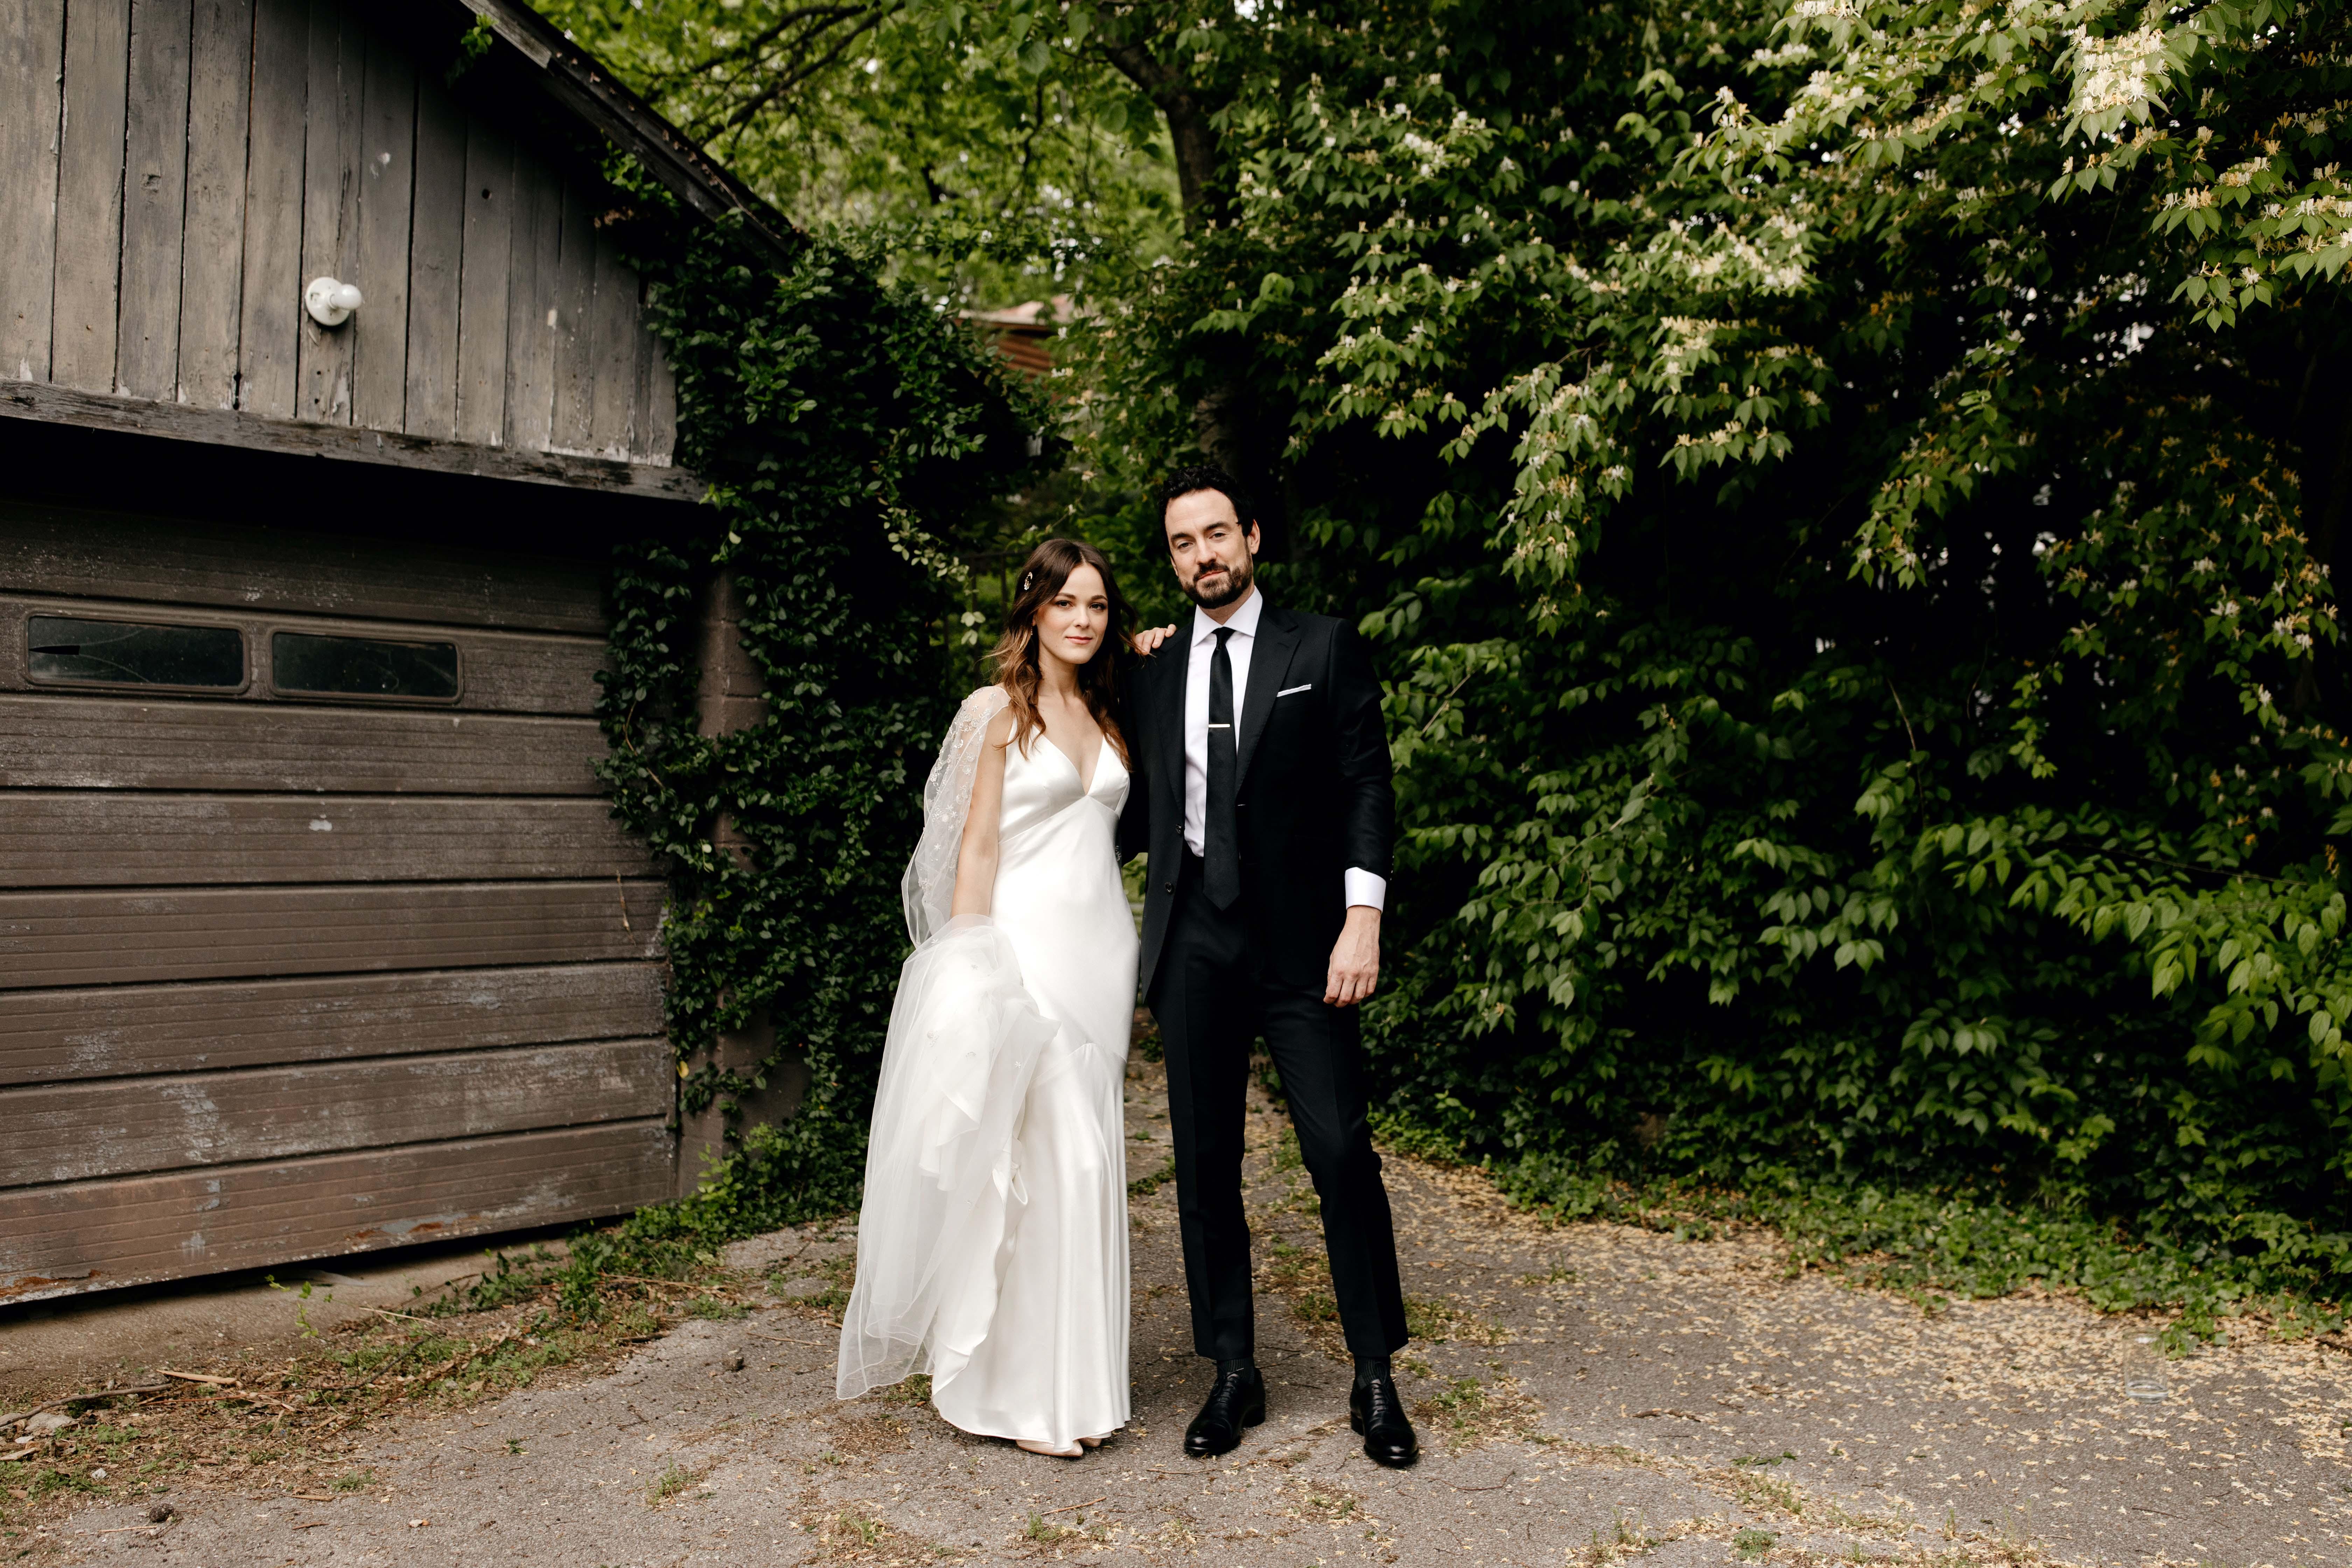 Jillian Jacqueline & Bryan Brown Bohemian Nashville Wedding